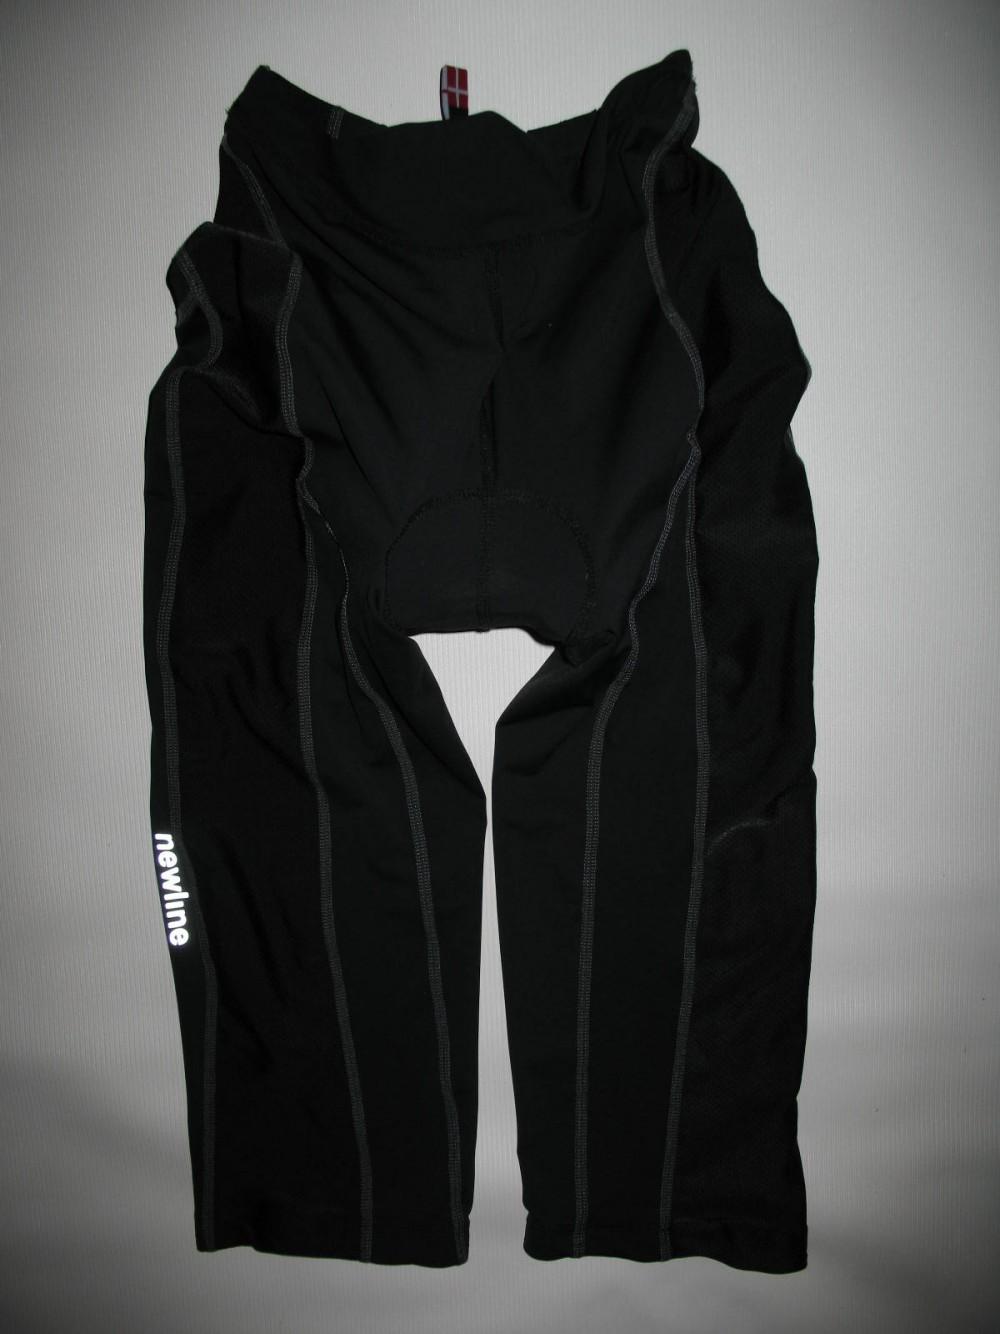 Велошорты NEWLINE cycling shorts lady (размер S/M) - 3